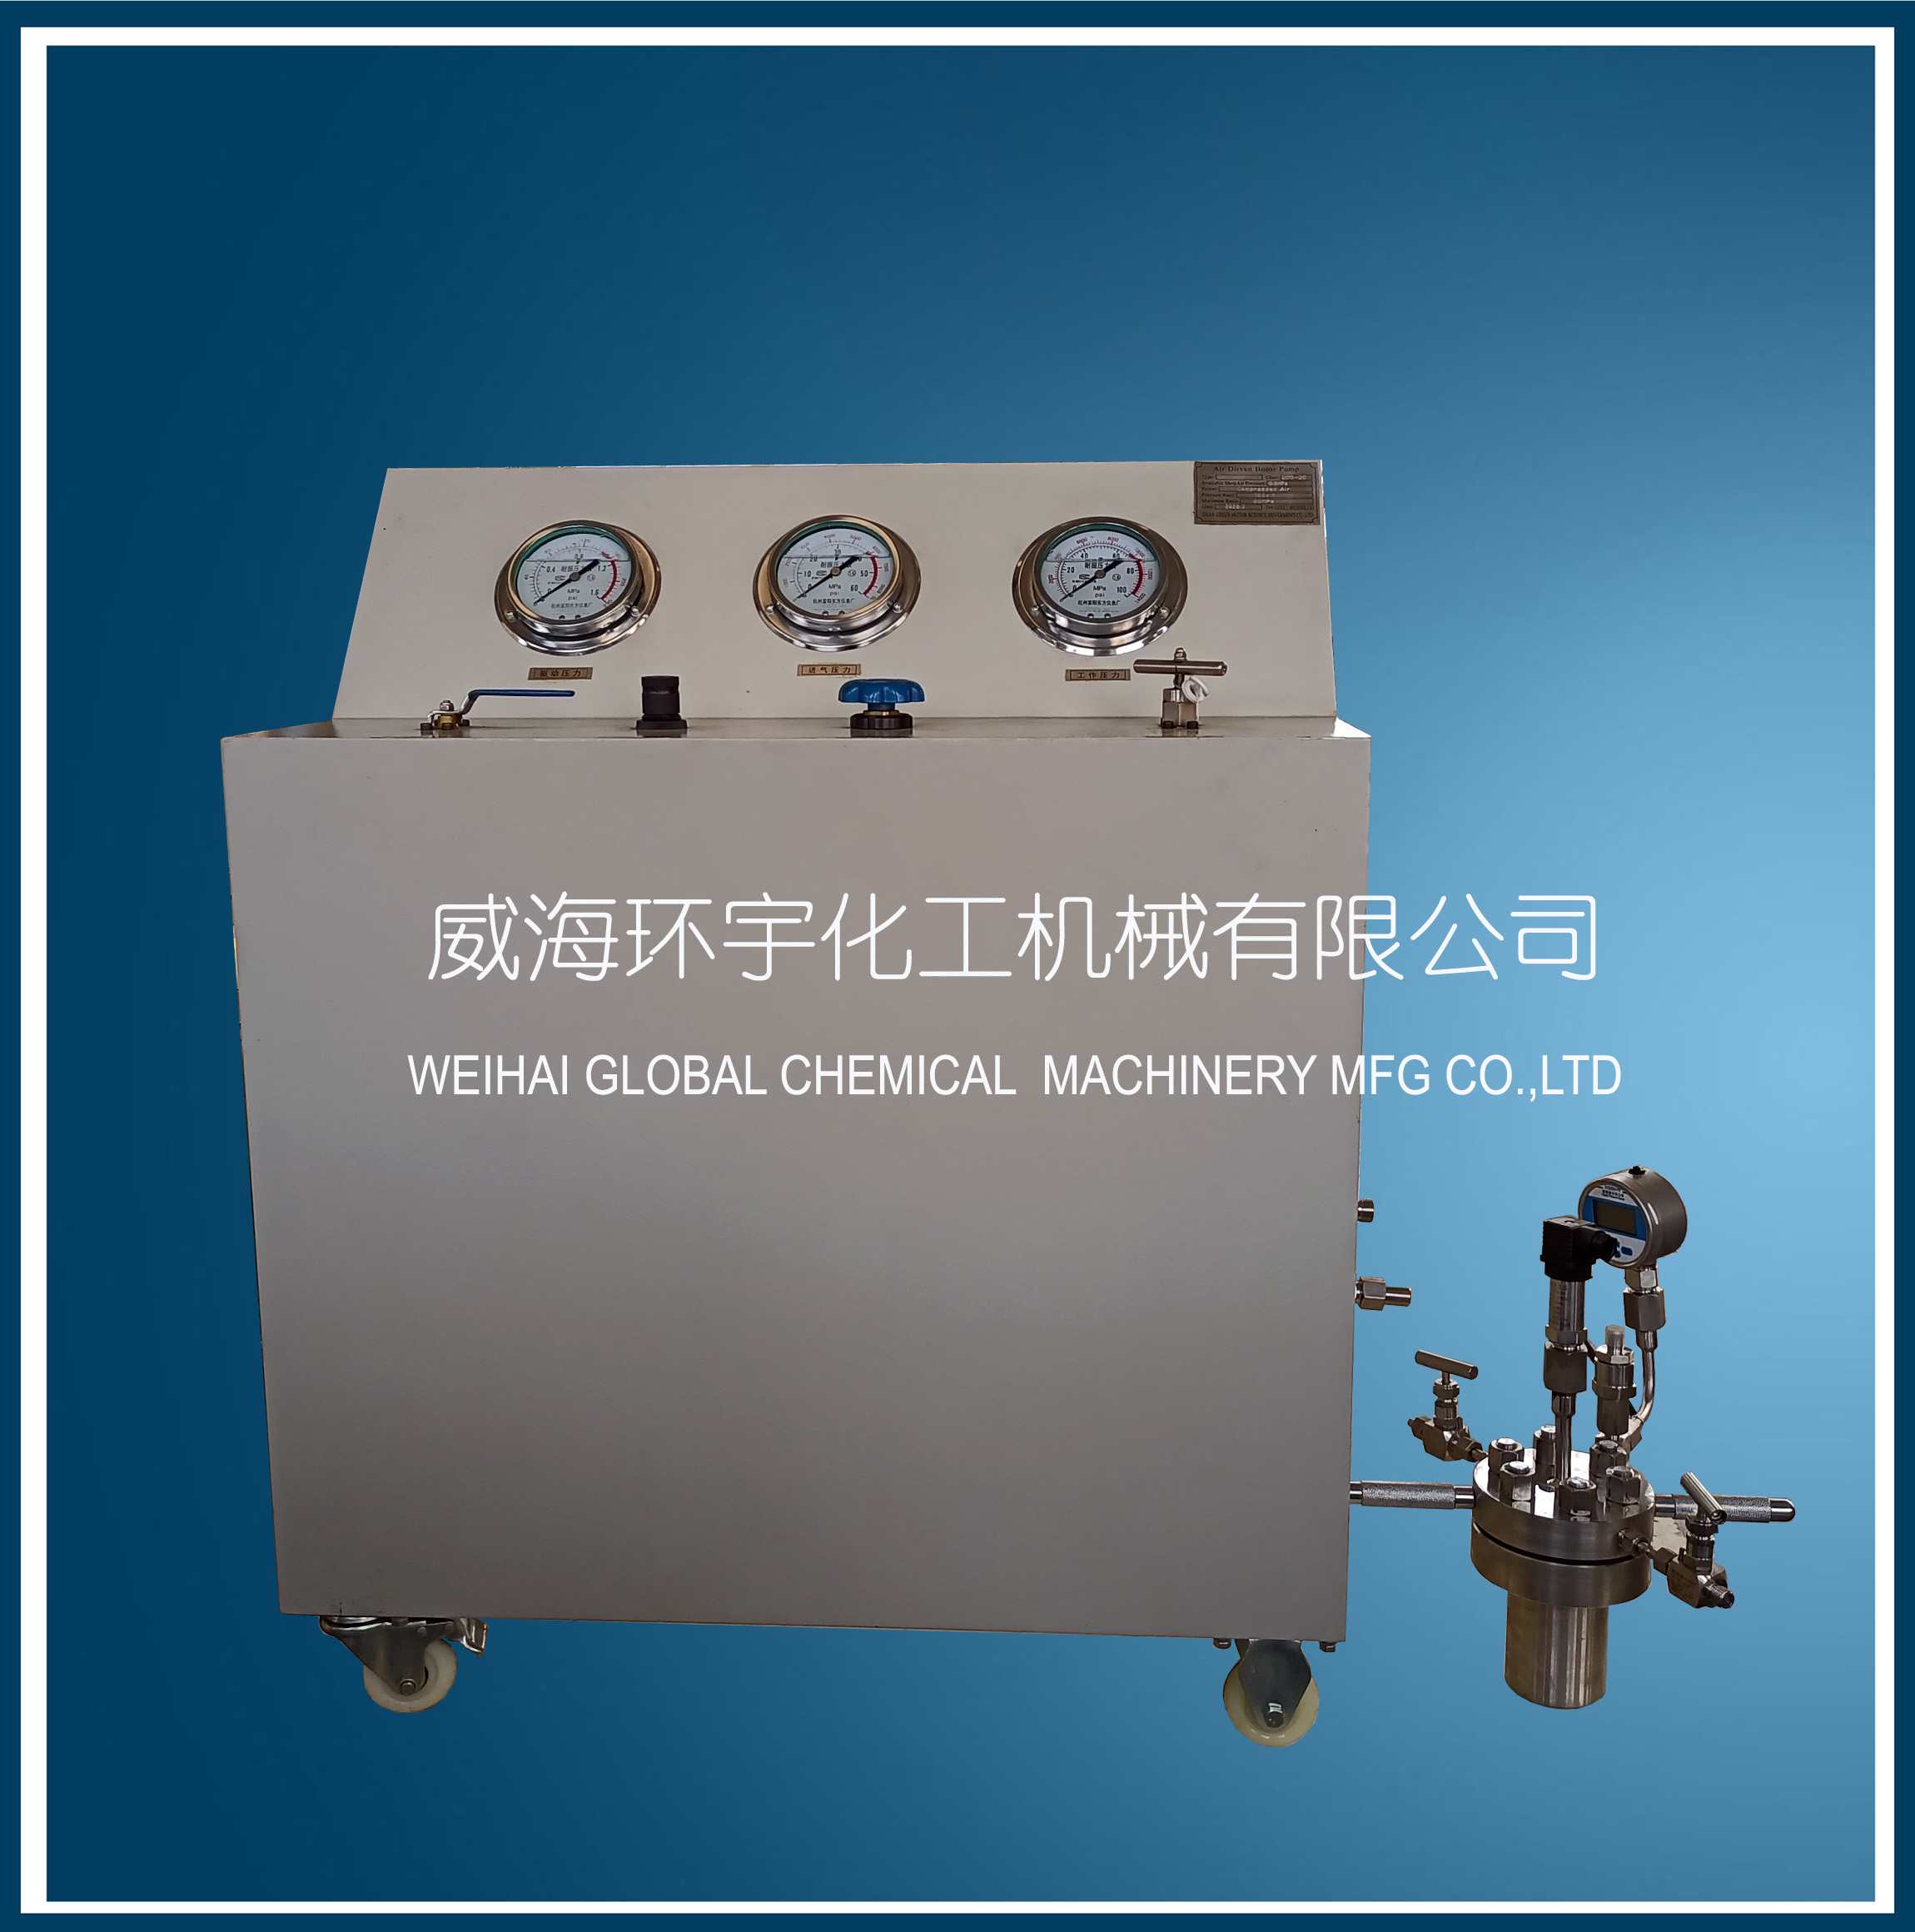 0.1L微型高压反应釜配增压泵已完工发往浙江客户处